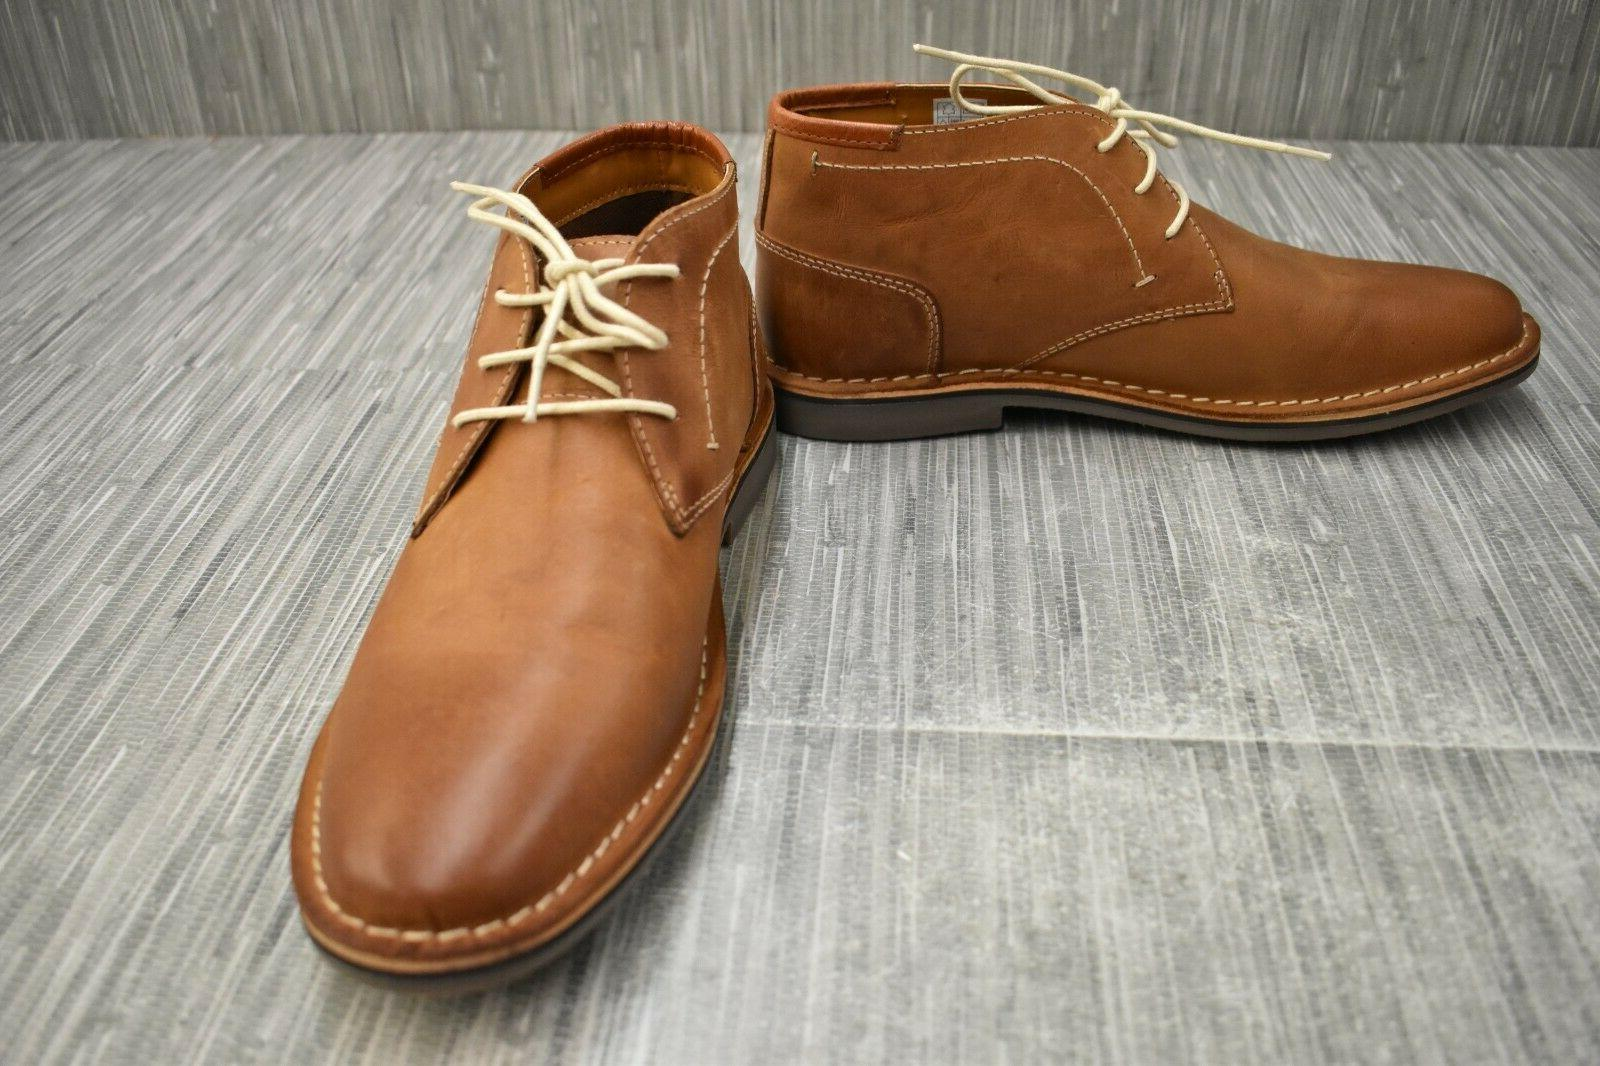 3ab4fb4fba2 Steve Madden Hestonn Leather Chukka Boots